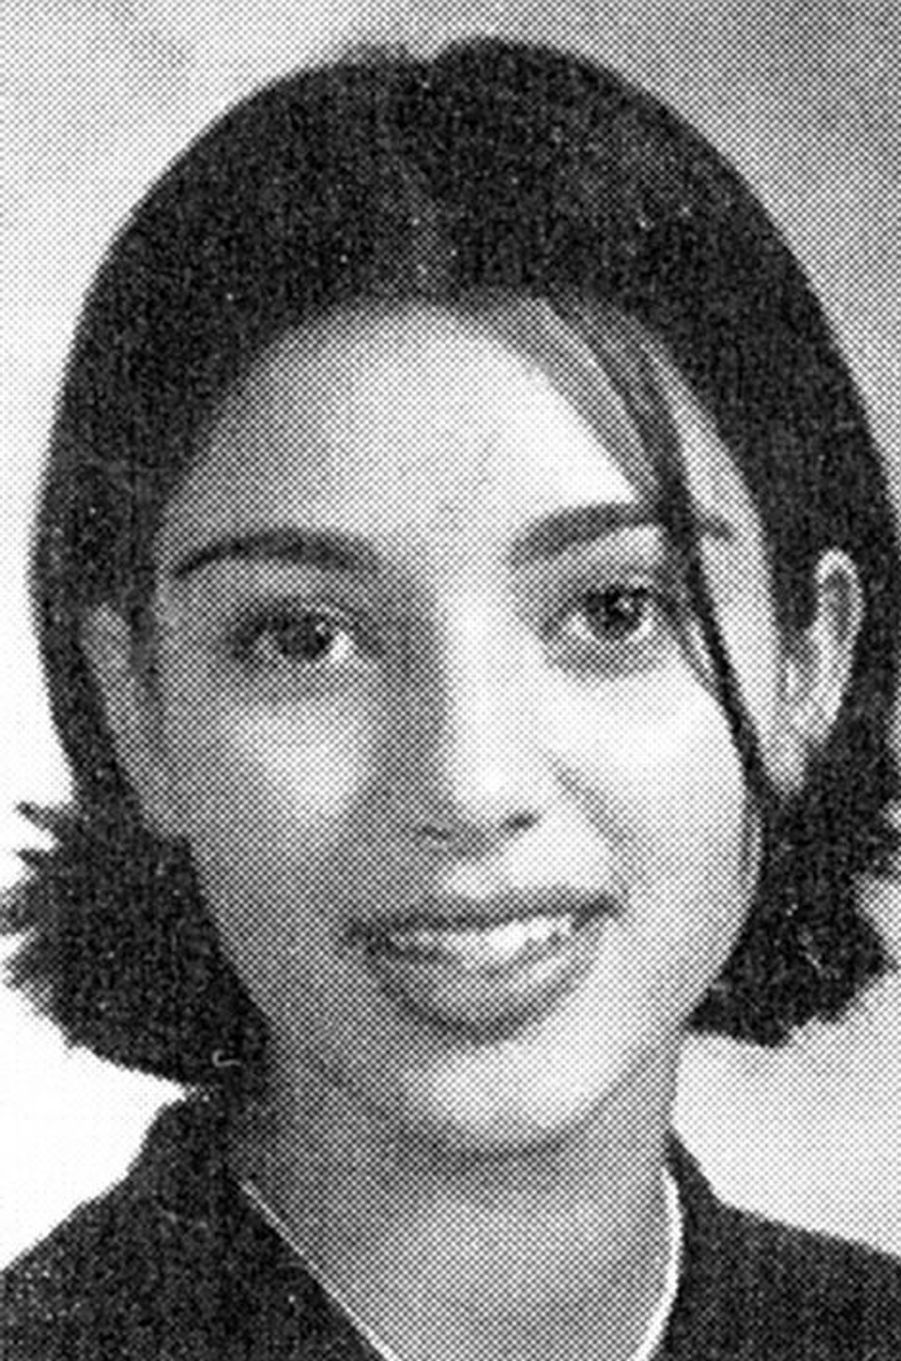 En 1995